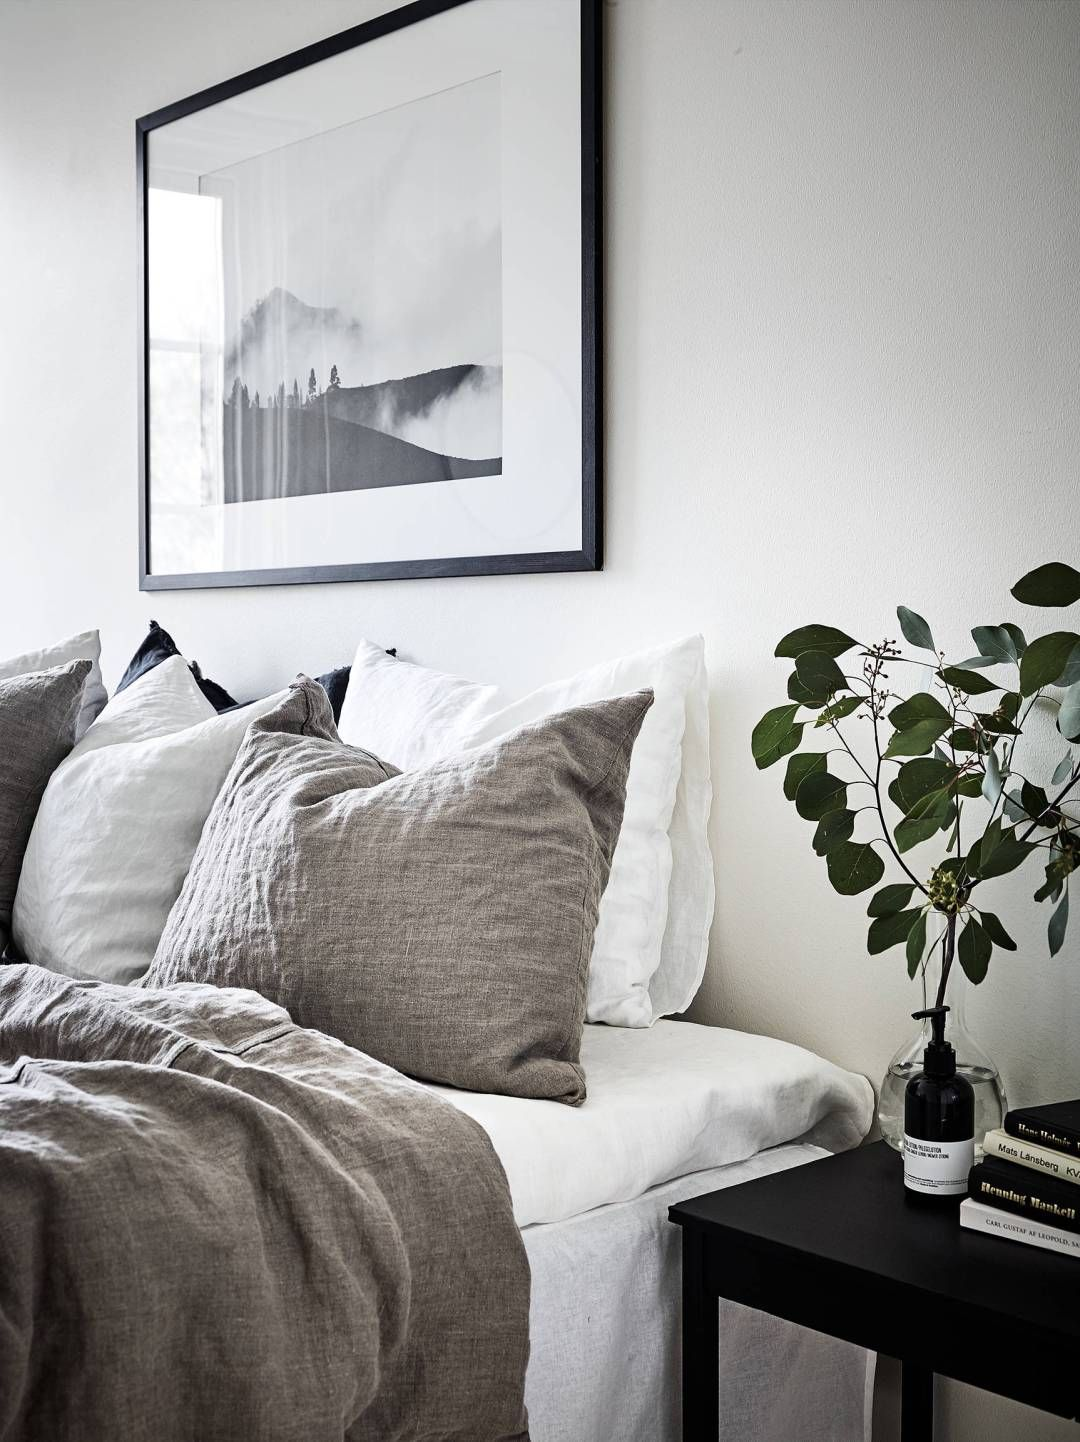 Mesa blanca, sillas negras | Bedrooms, Interiors and Room